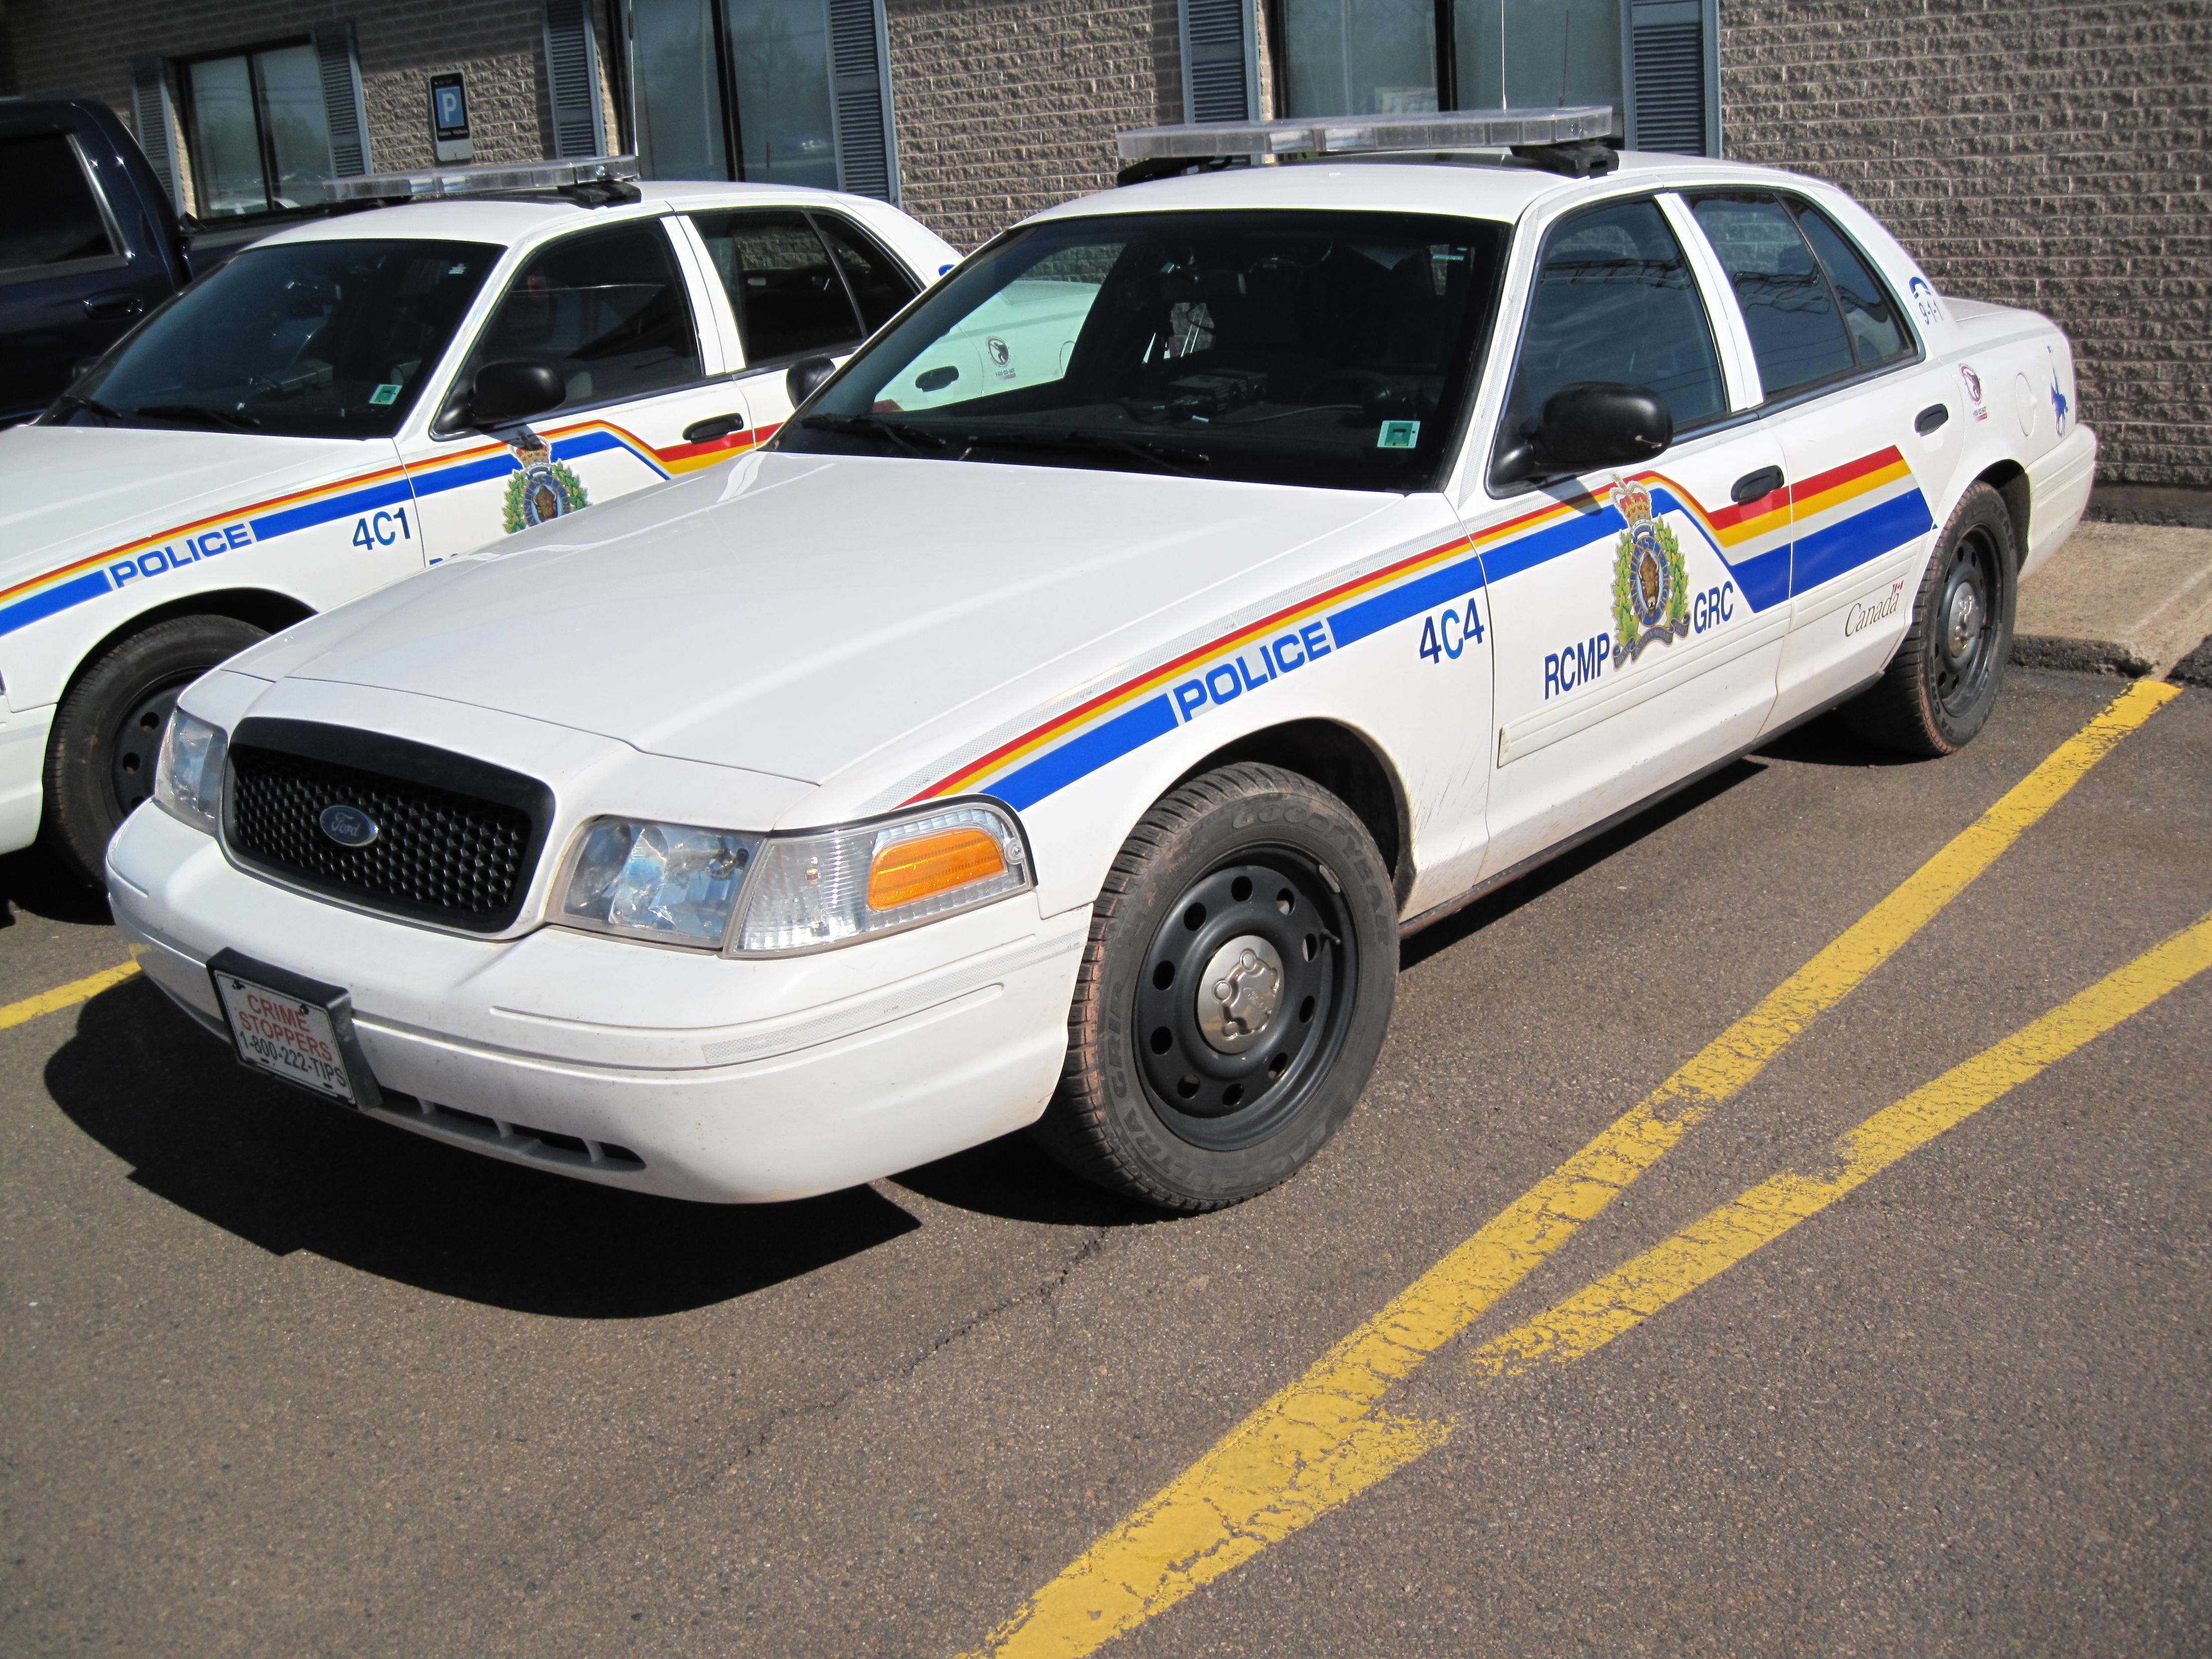 http://upload.wikimedia.org/wikipedia/commons/e/eb/Royal_Canadian_Mounted_Police_car_(Cananda)_02.JPG